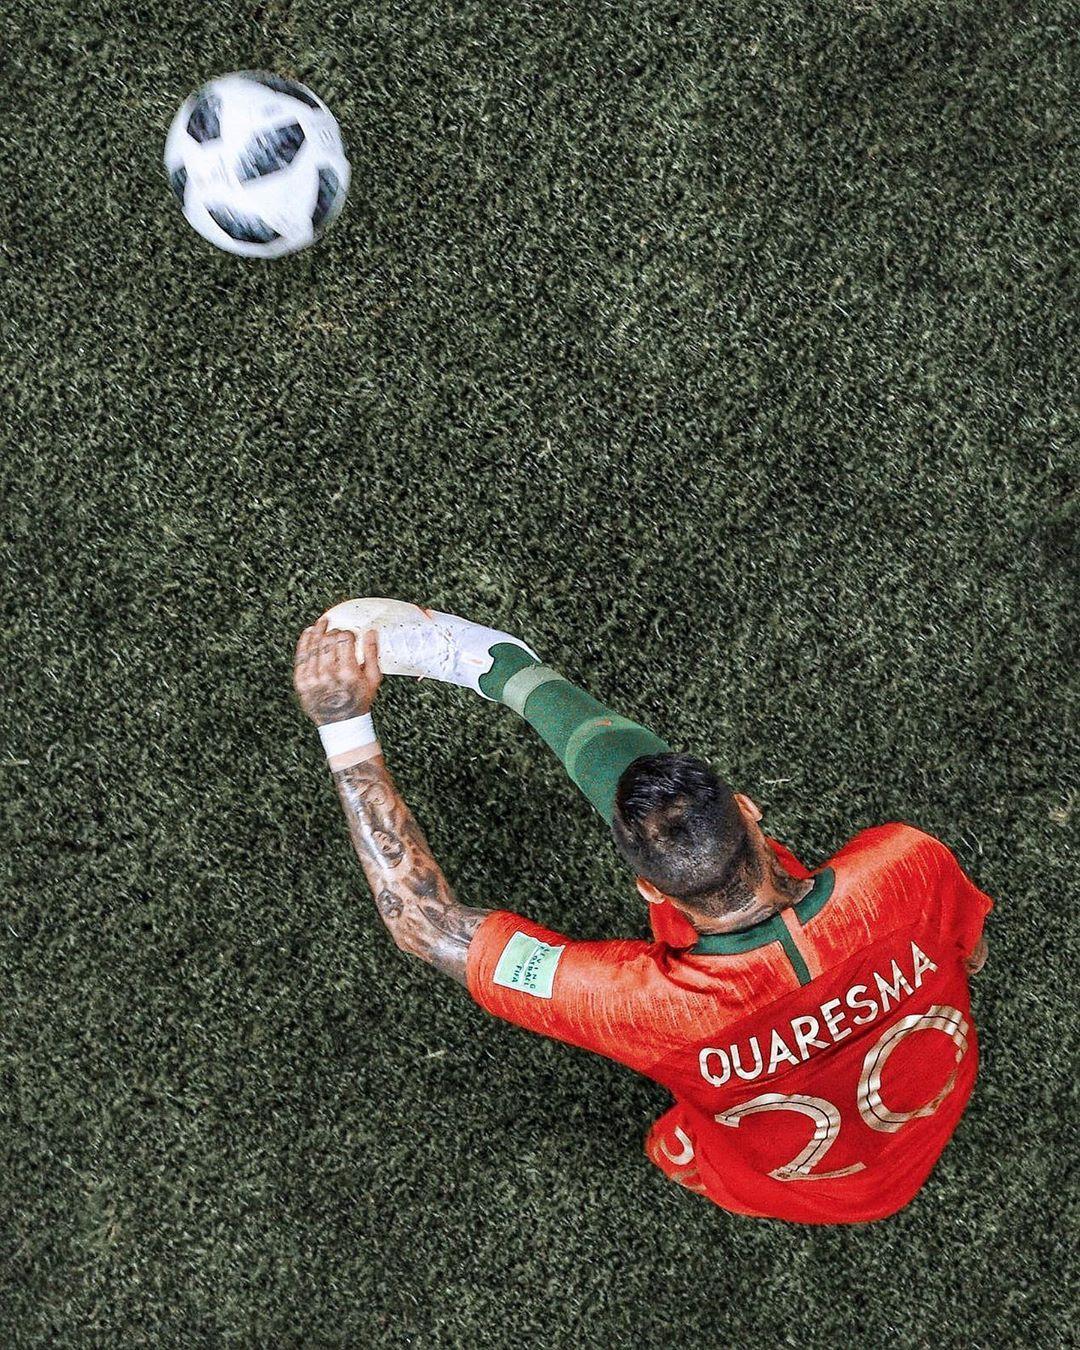 Soccer Football On Instagram Siri Define The Word Trivela Ricardo Quaresma Quaresma Ronaldo Football Manchester United Wallpaper Football